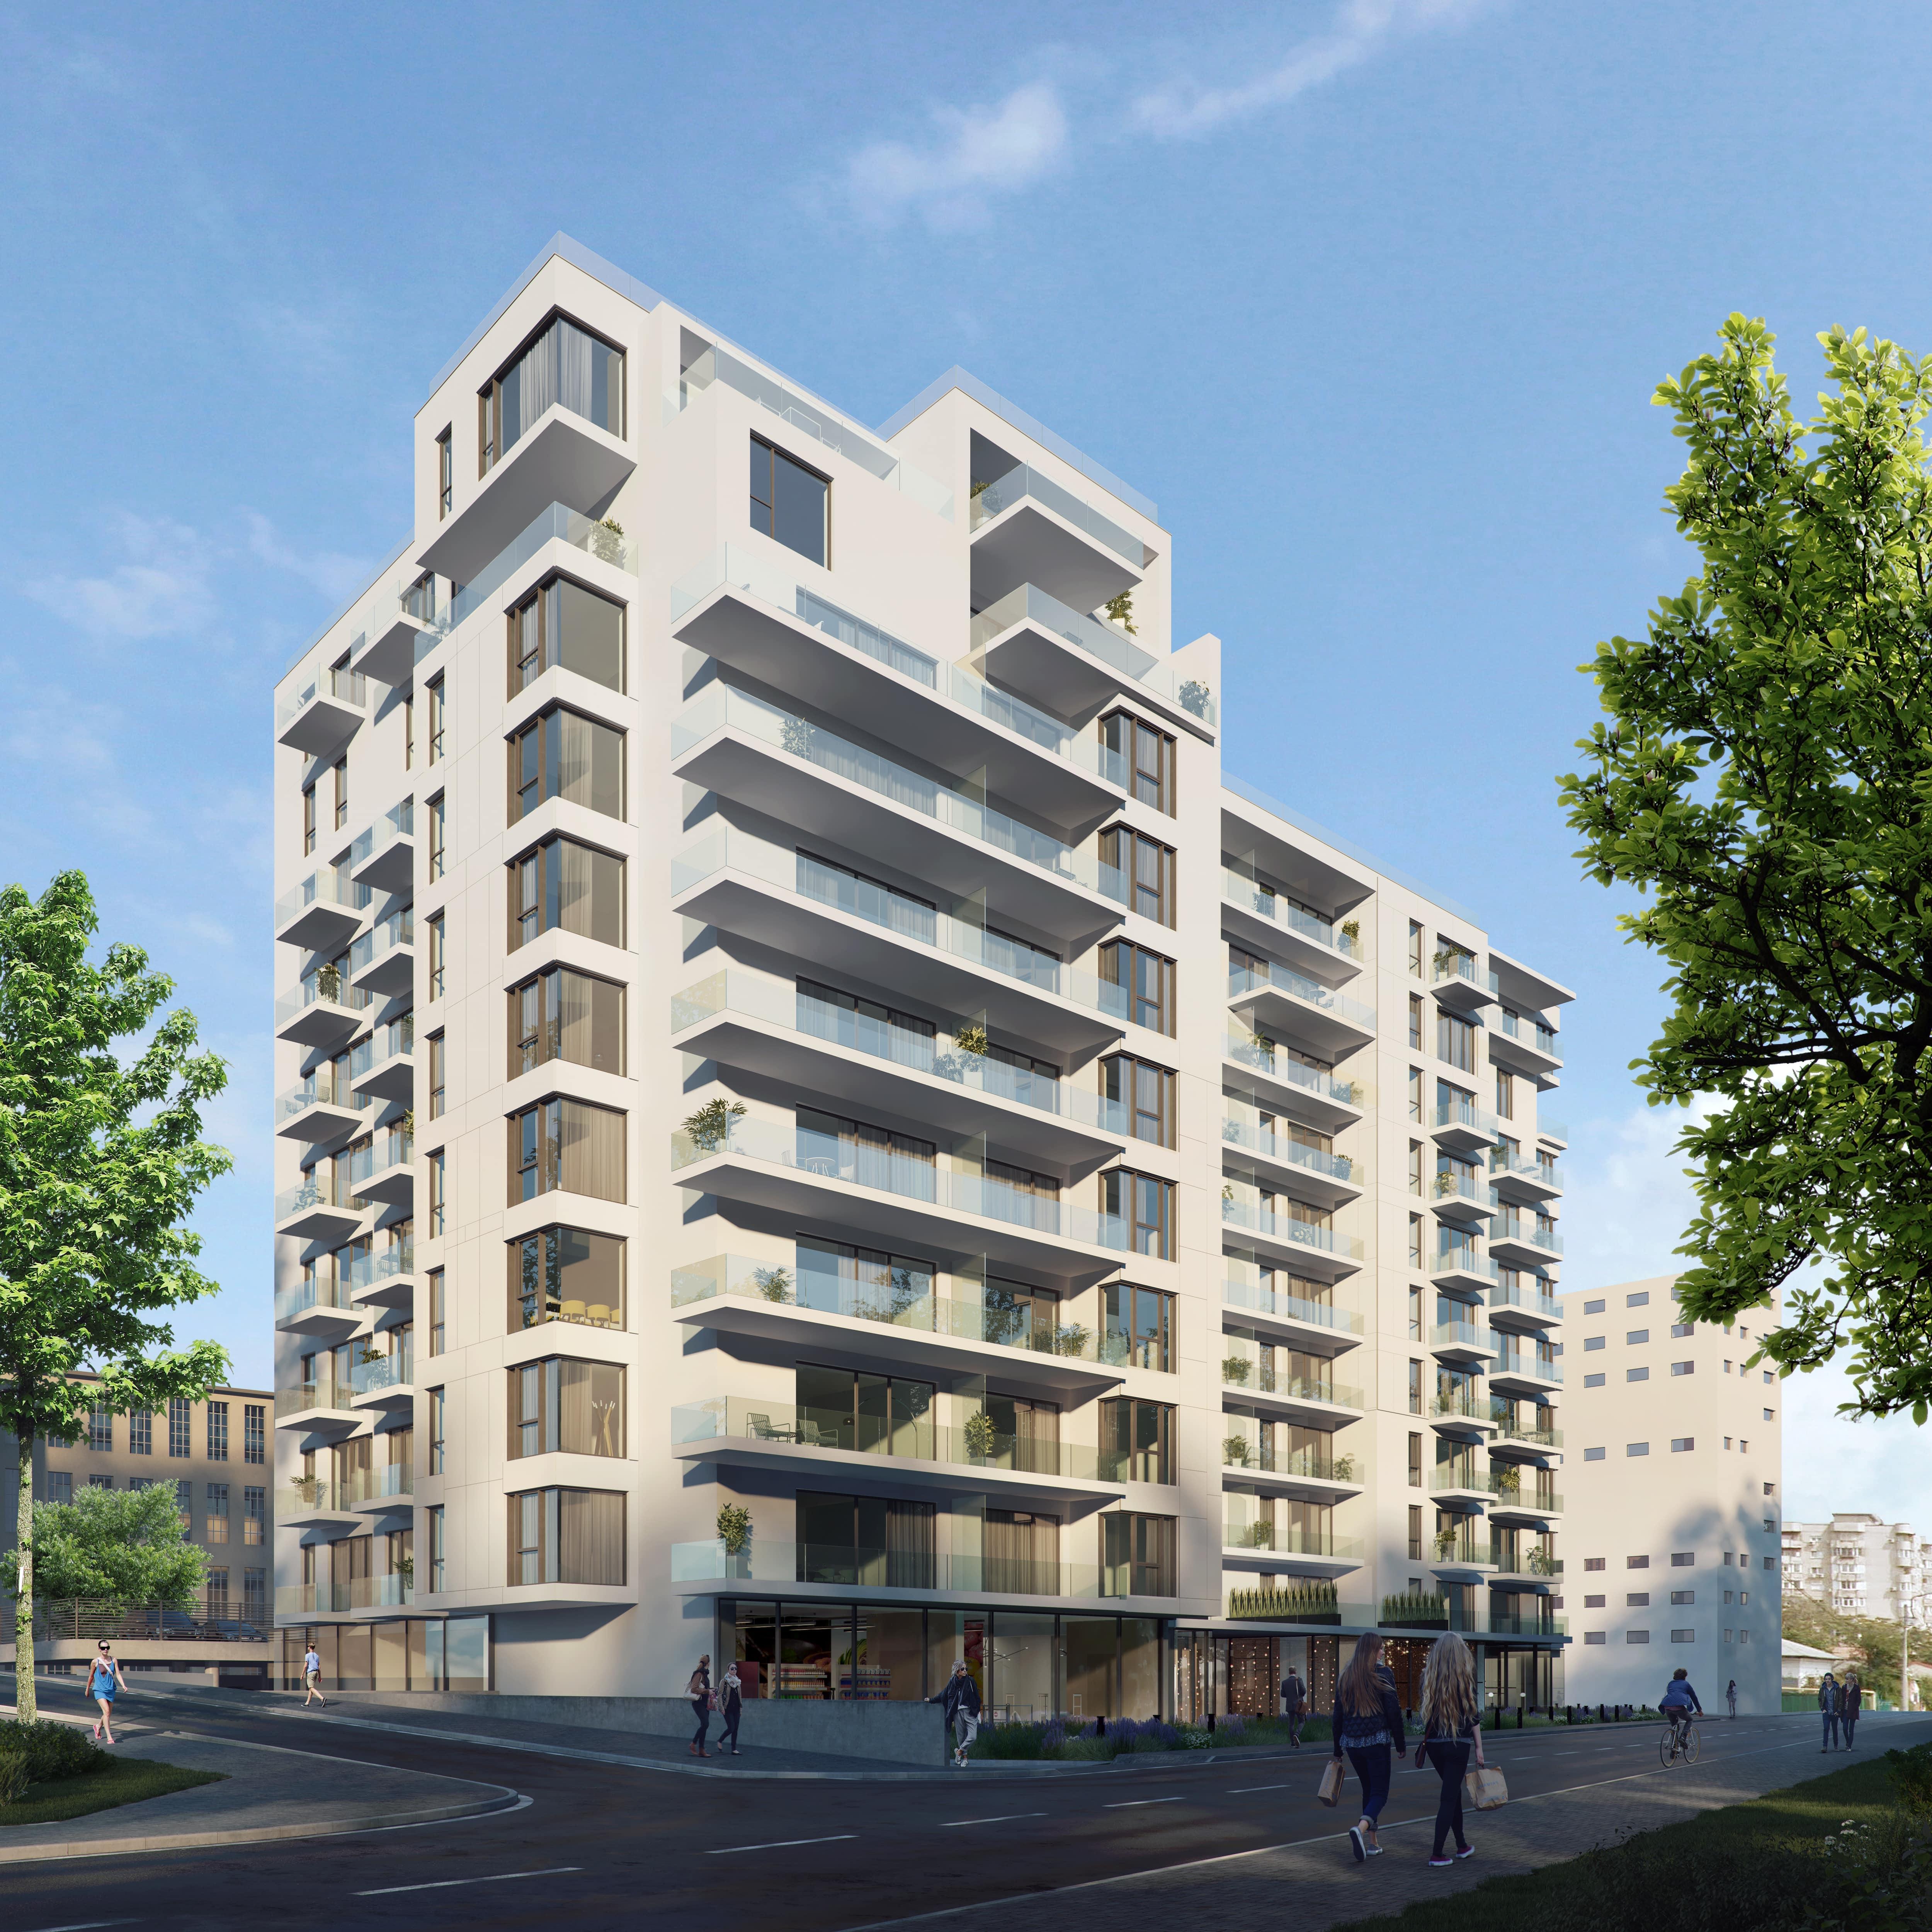 https://ahe-ro.s3.amazonaws.com/8247/penthouse-si-apartamente-unirii-%286%29.jpg